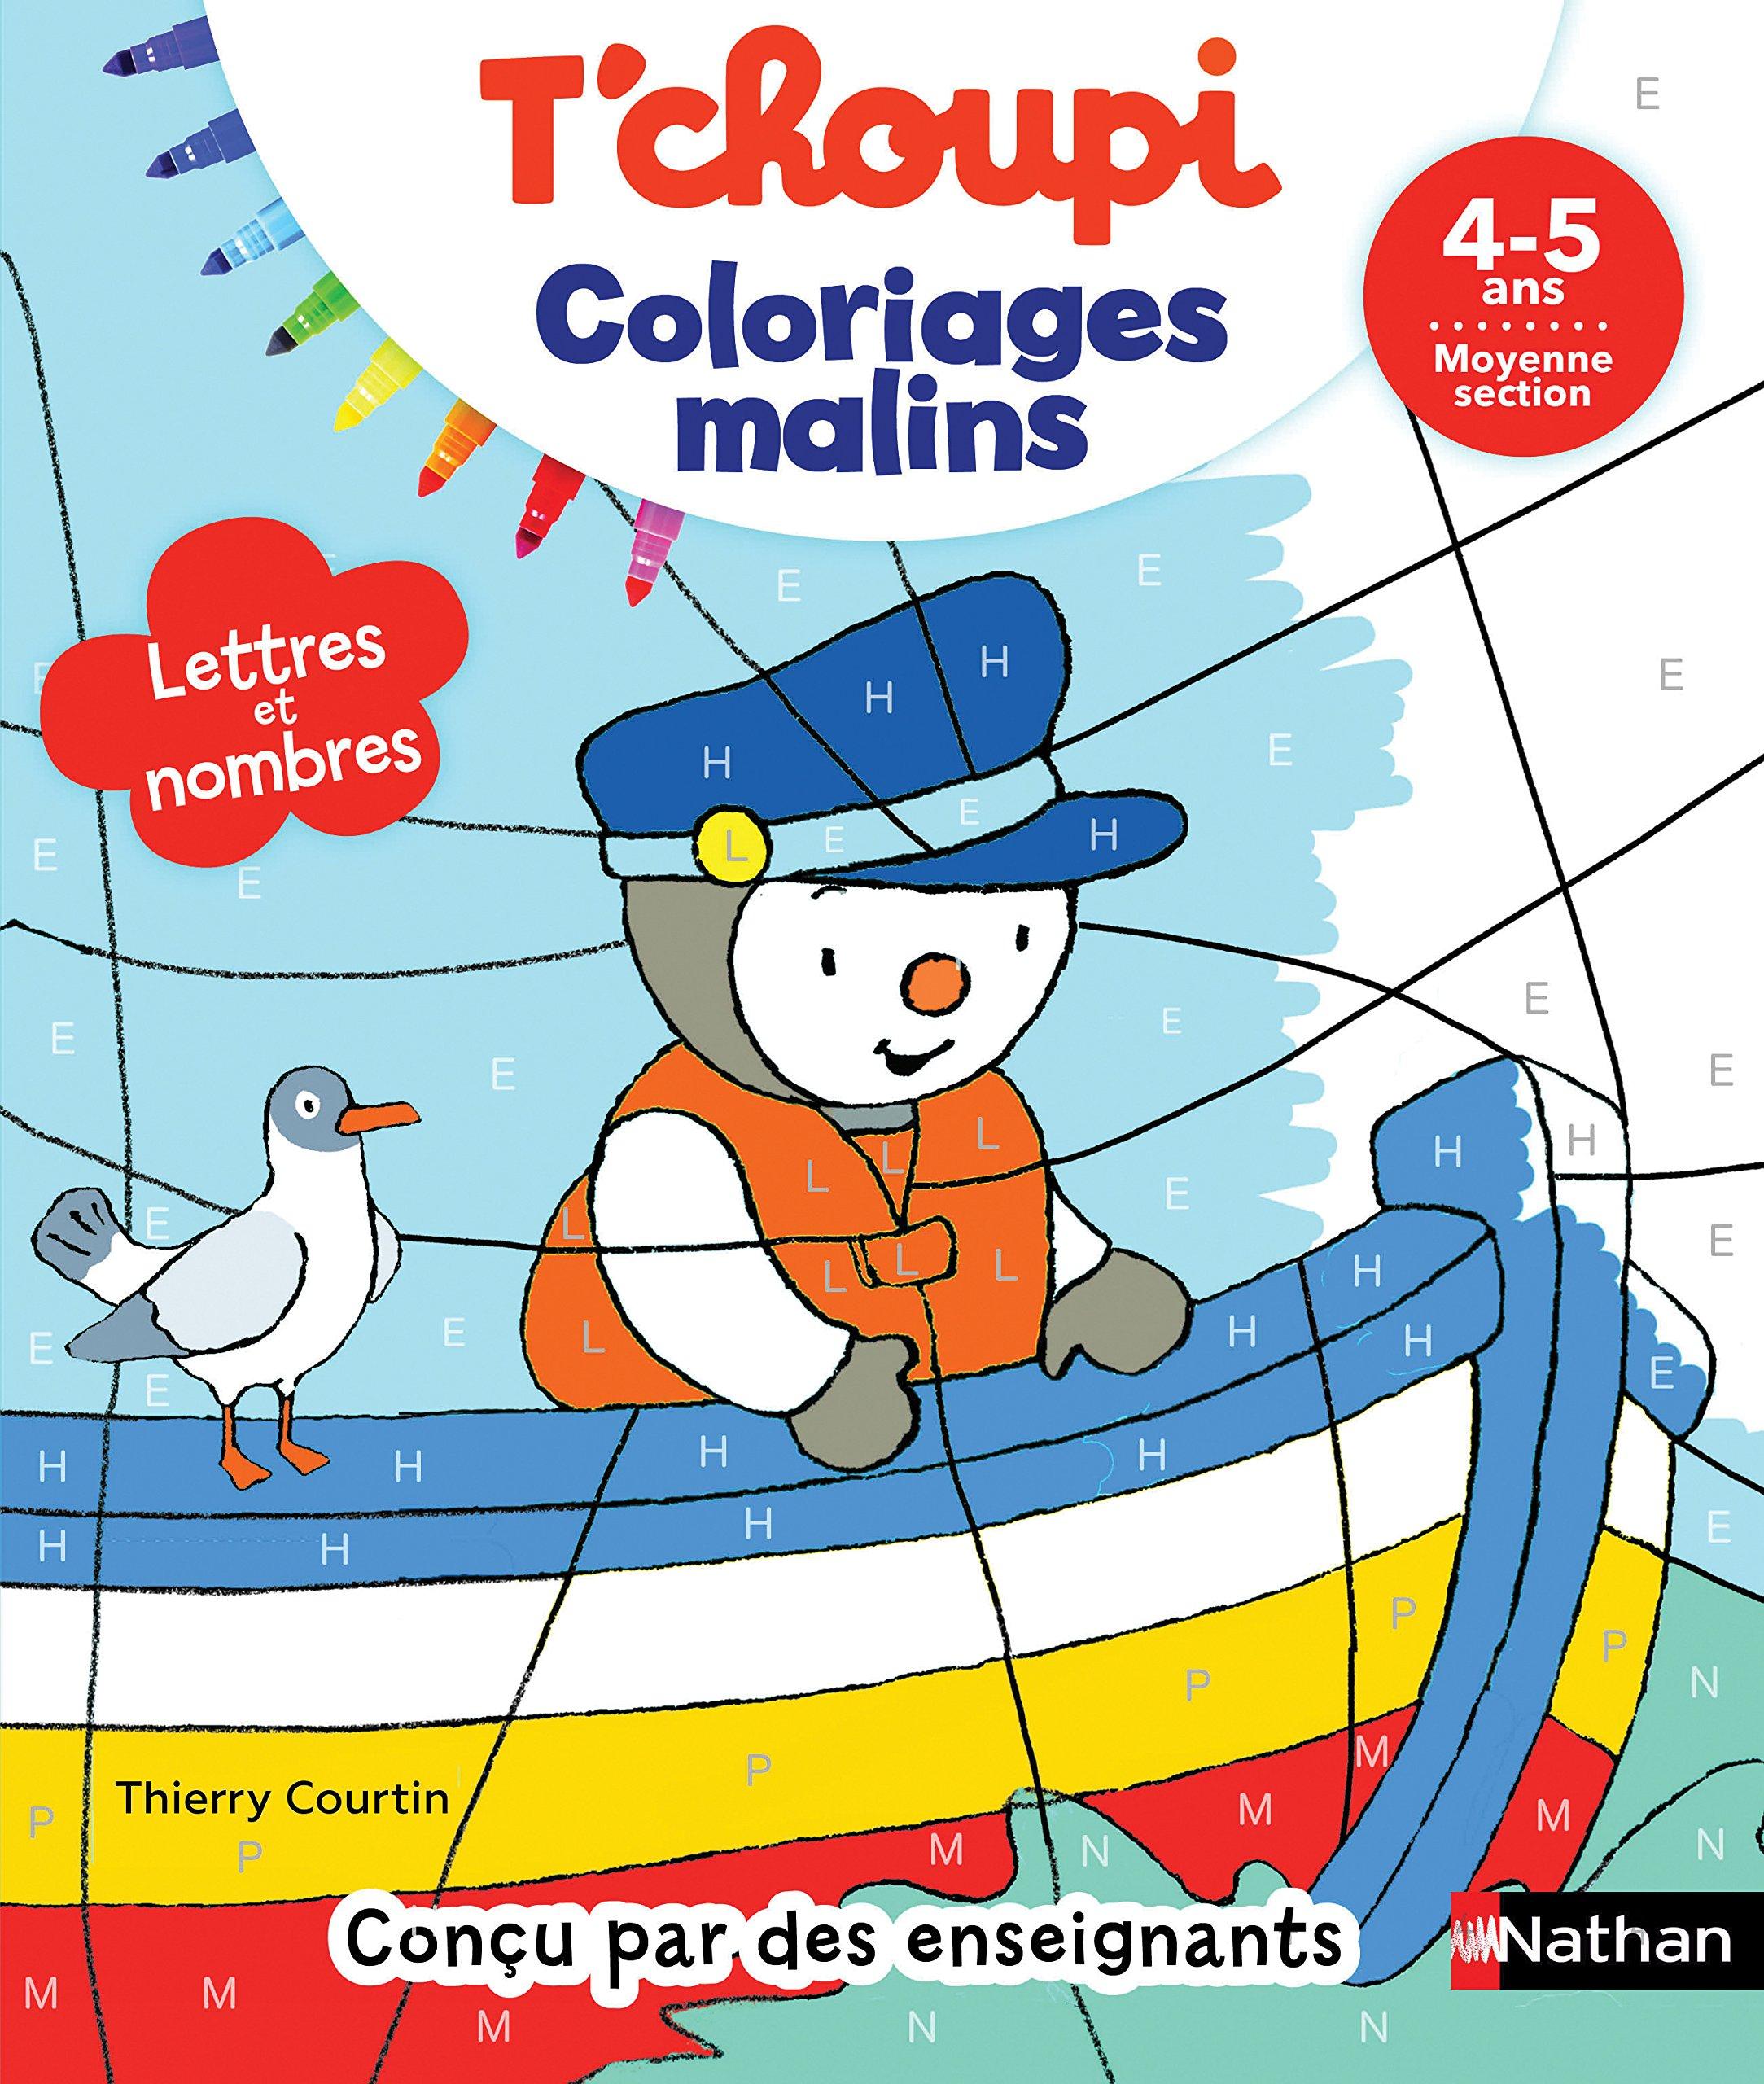 T Choupi Coloriages Malins Lettres Et Nombres Magiques Maternelle Moyenne Section 4 5 Ans Amazon Fr Courtin Thierry Courtin Thierry Livres